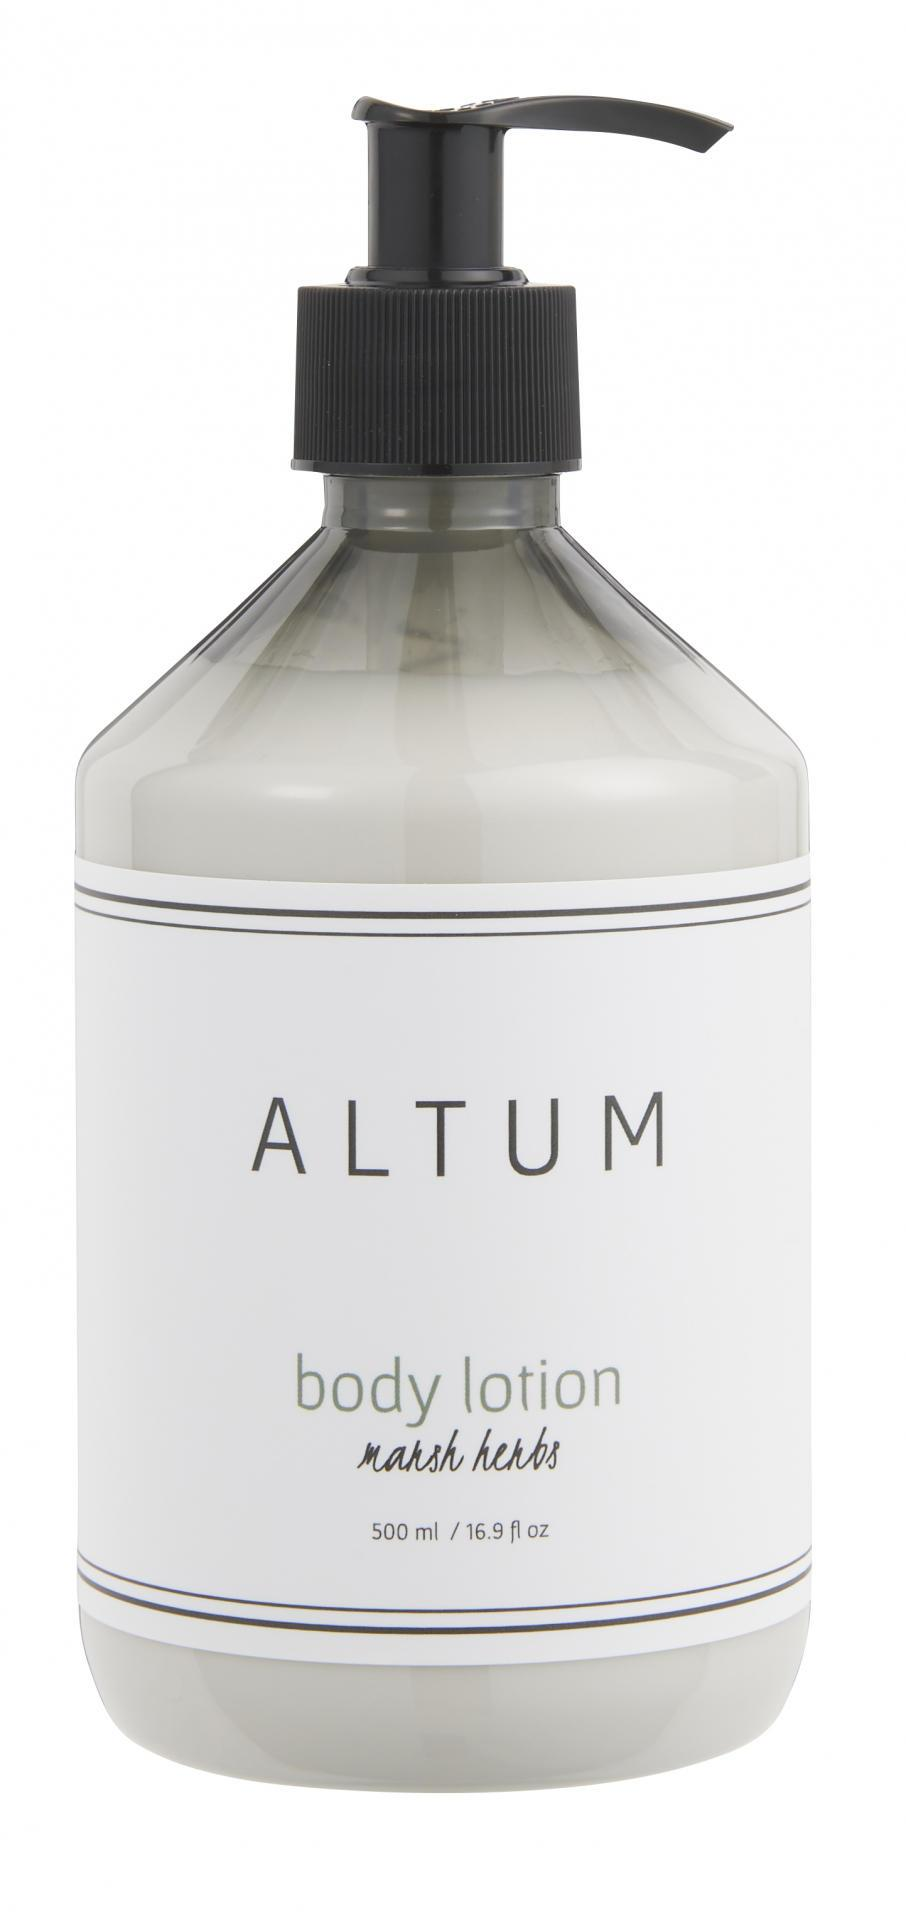 IB LAURSEN Tělové mléko ALTUM - Marsh Herbs 500ml, bílá barva, plast